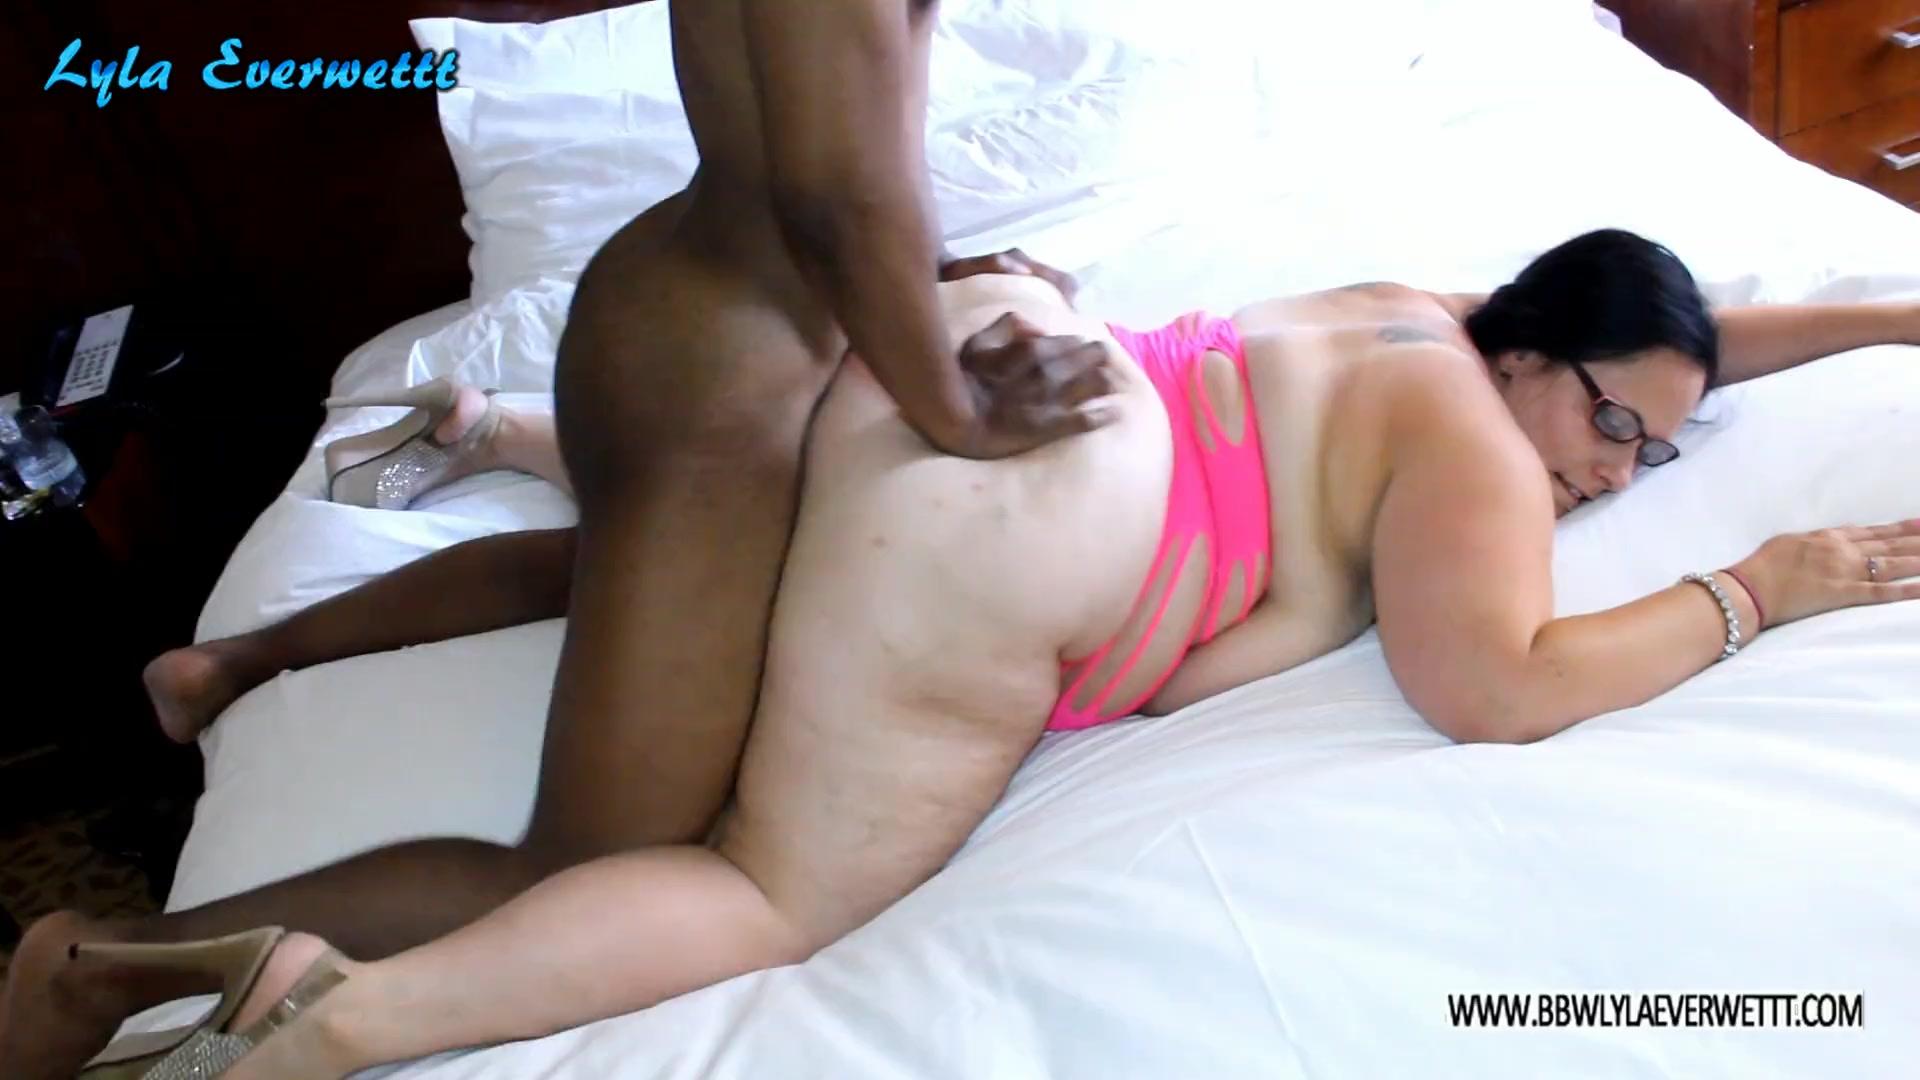 furniture sex positions xhamster sex factor